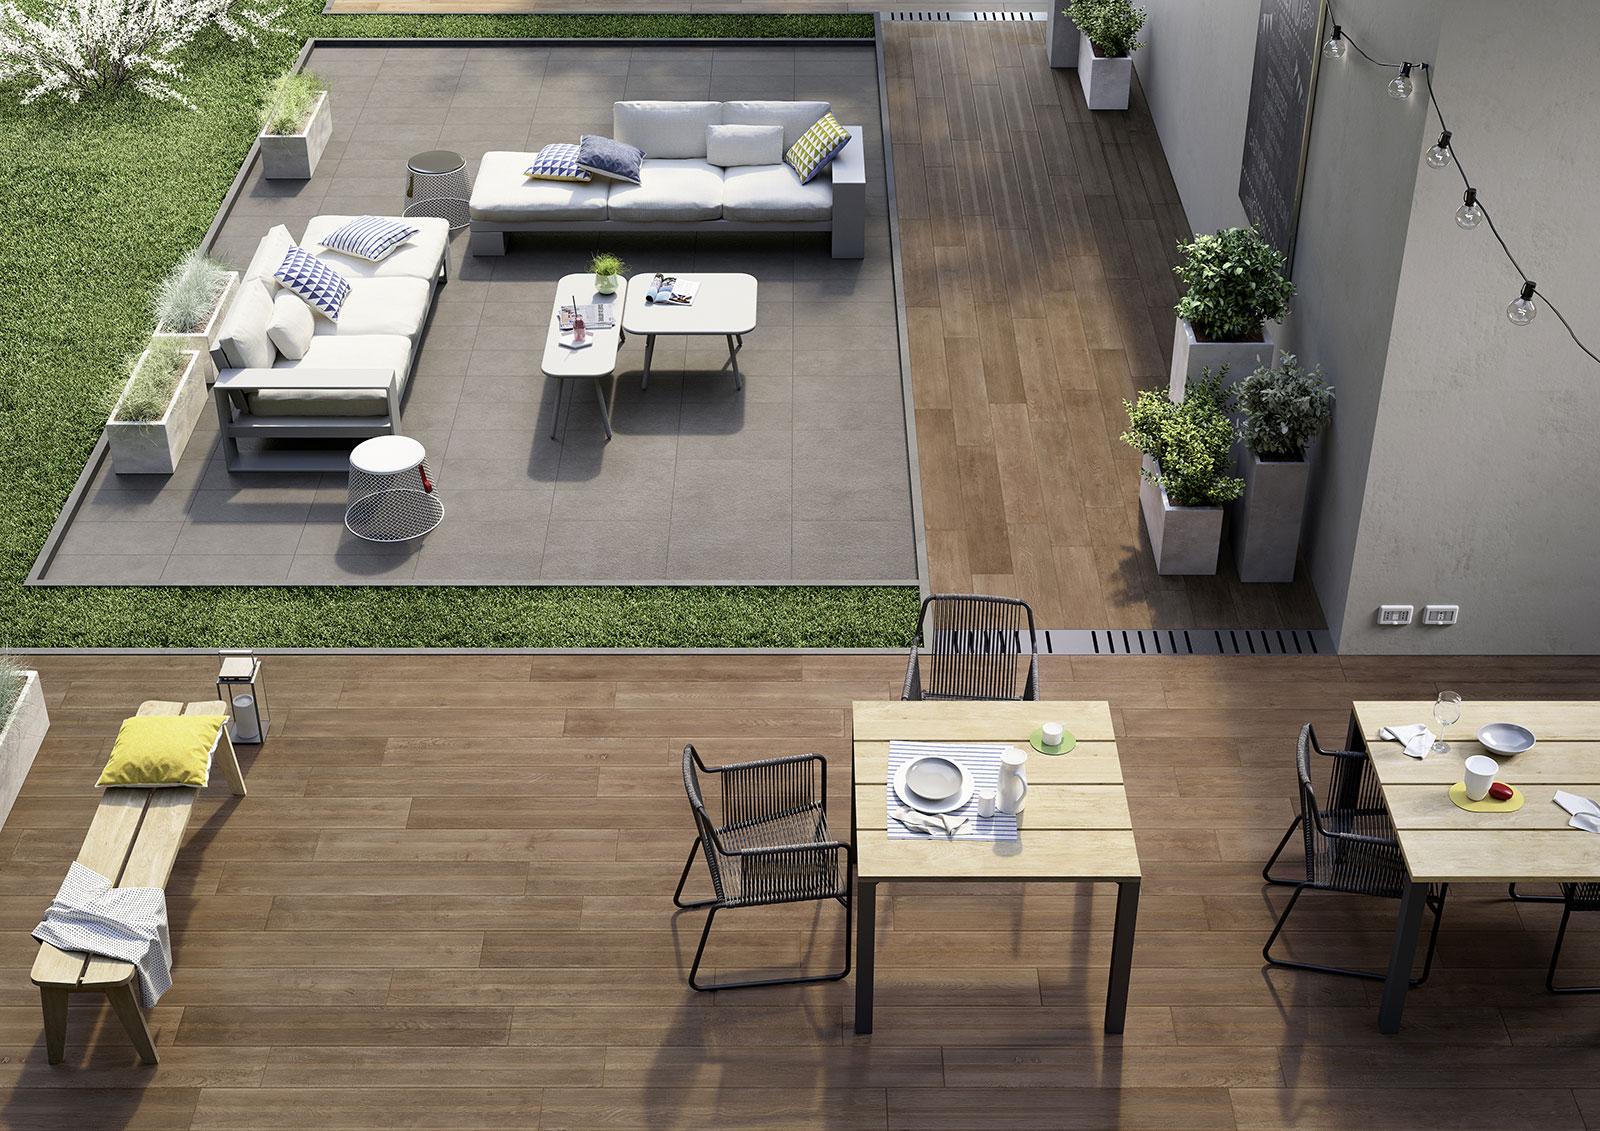 Treverktime gres imitaci n madera para pavimento marazzi for Pavimento imitacion madera